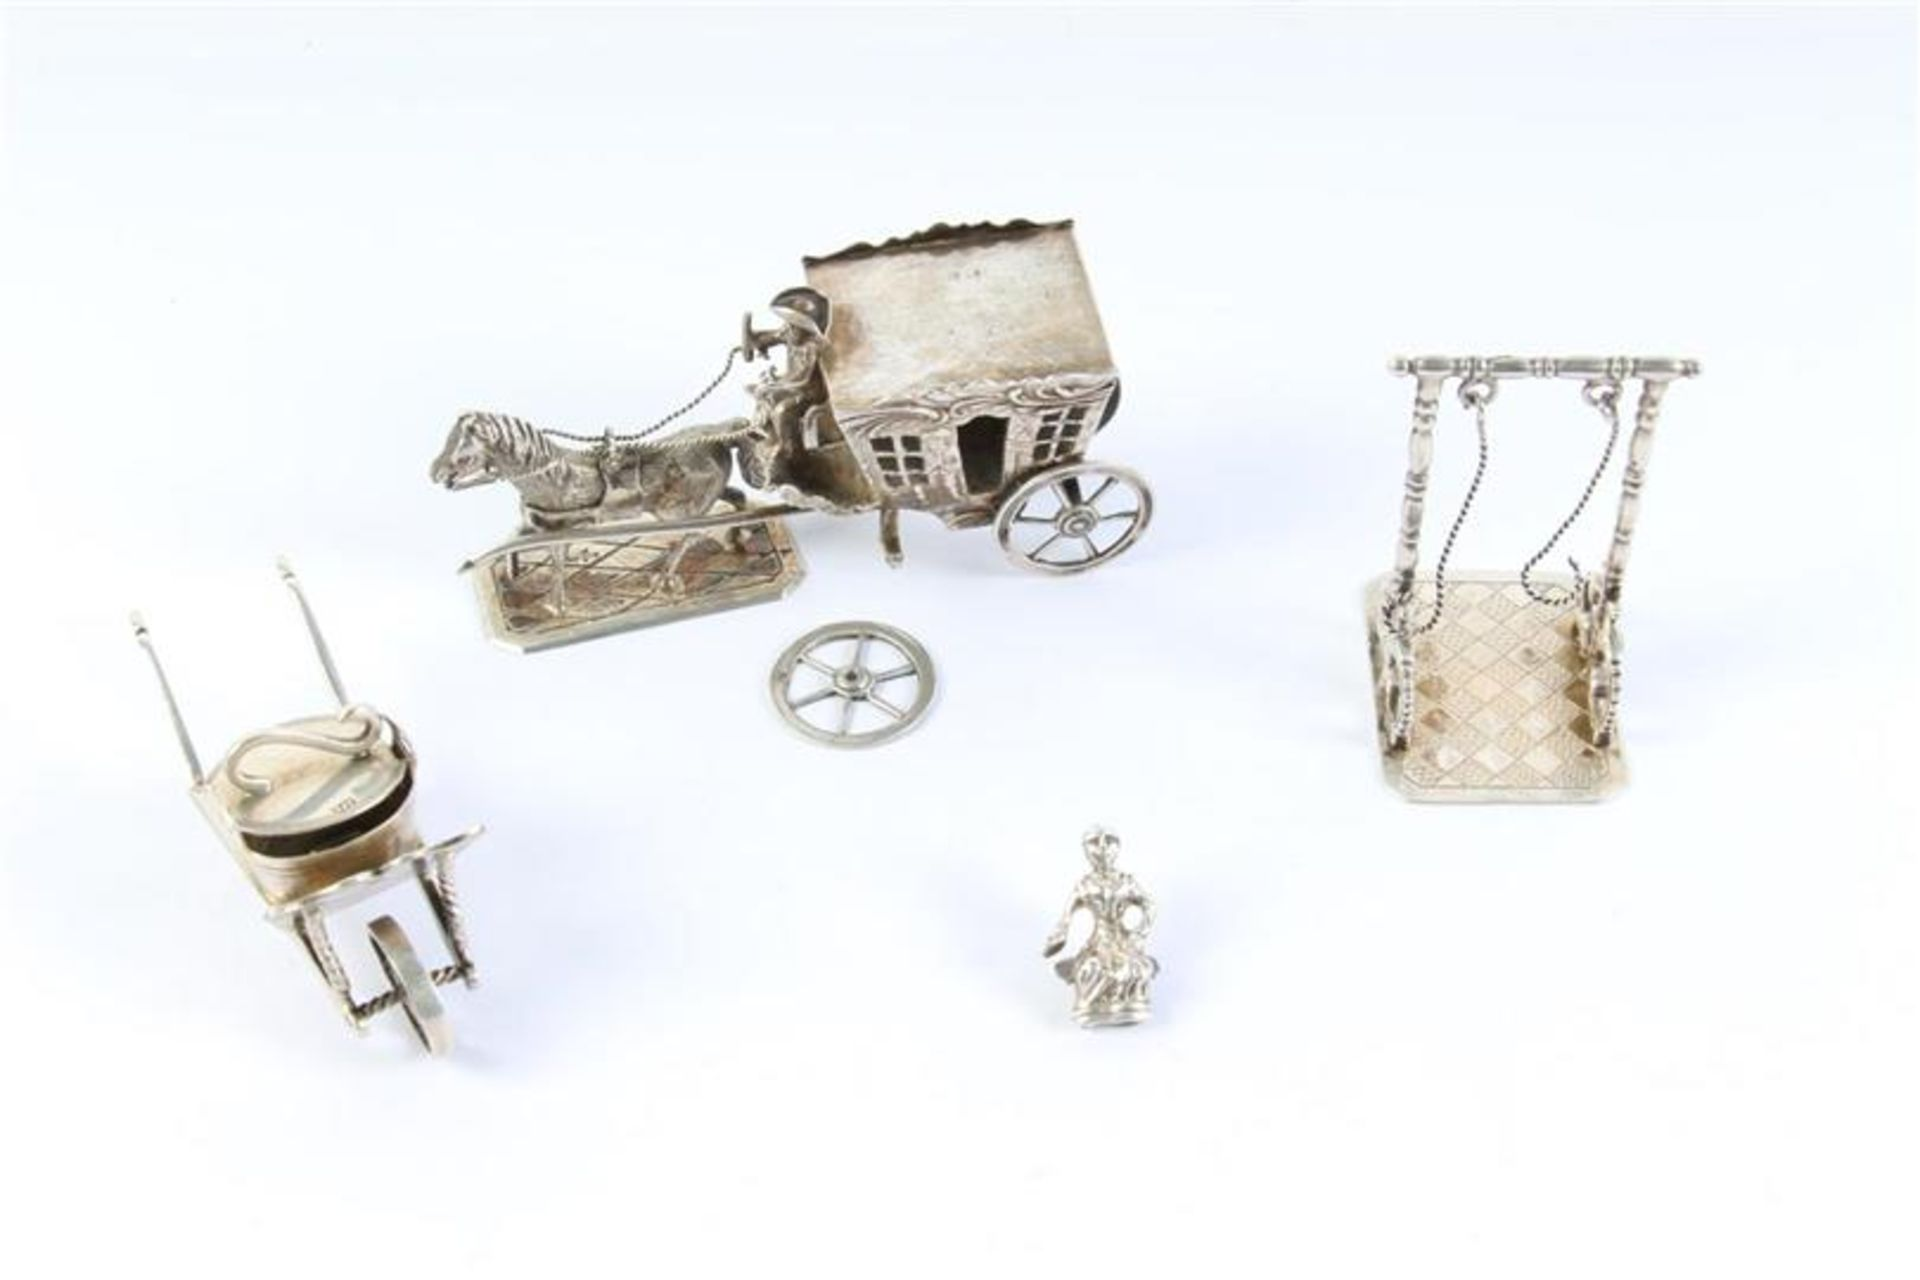 Set van drie zilveren miniaturen, Hollands gekeurd. Gewicht: 99.1 g. - Bild 2 aus 2